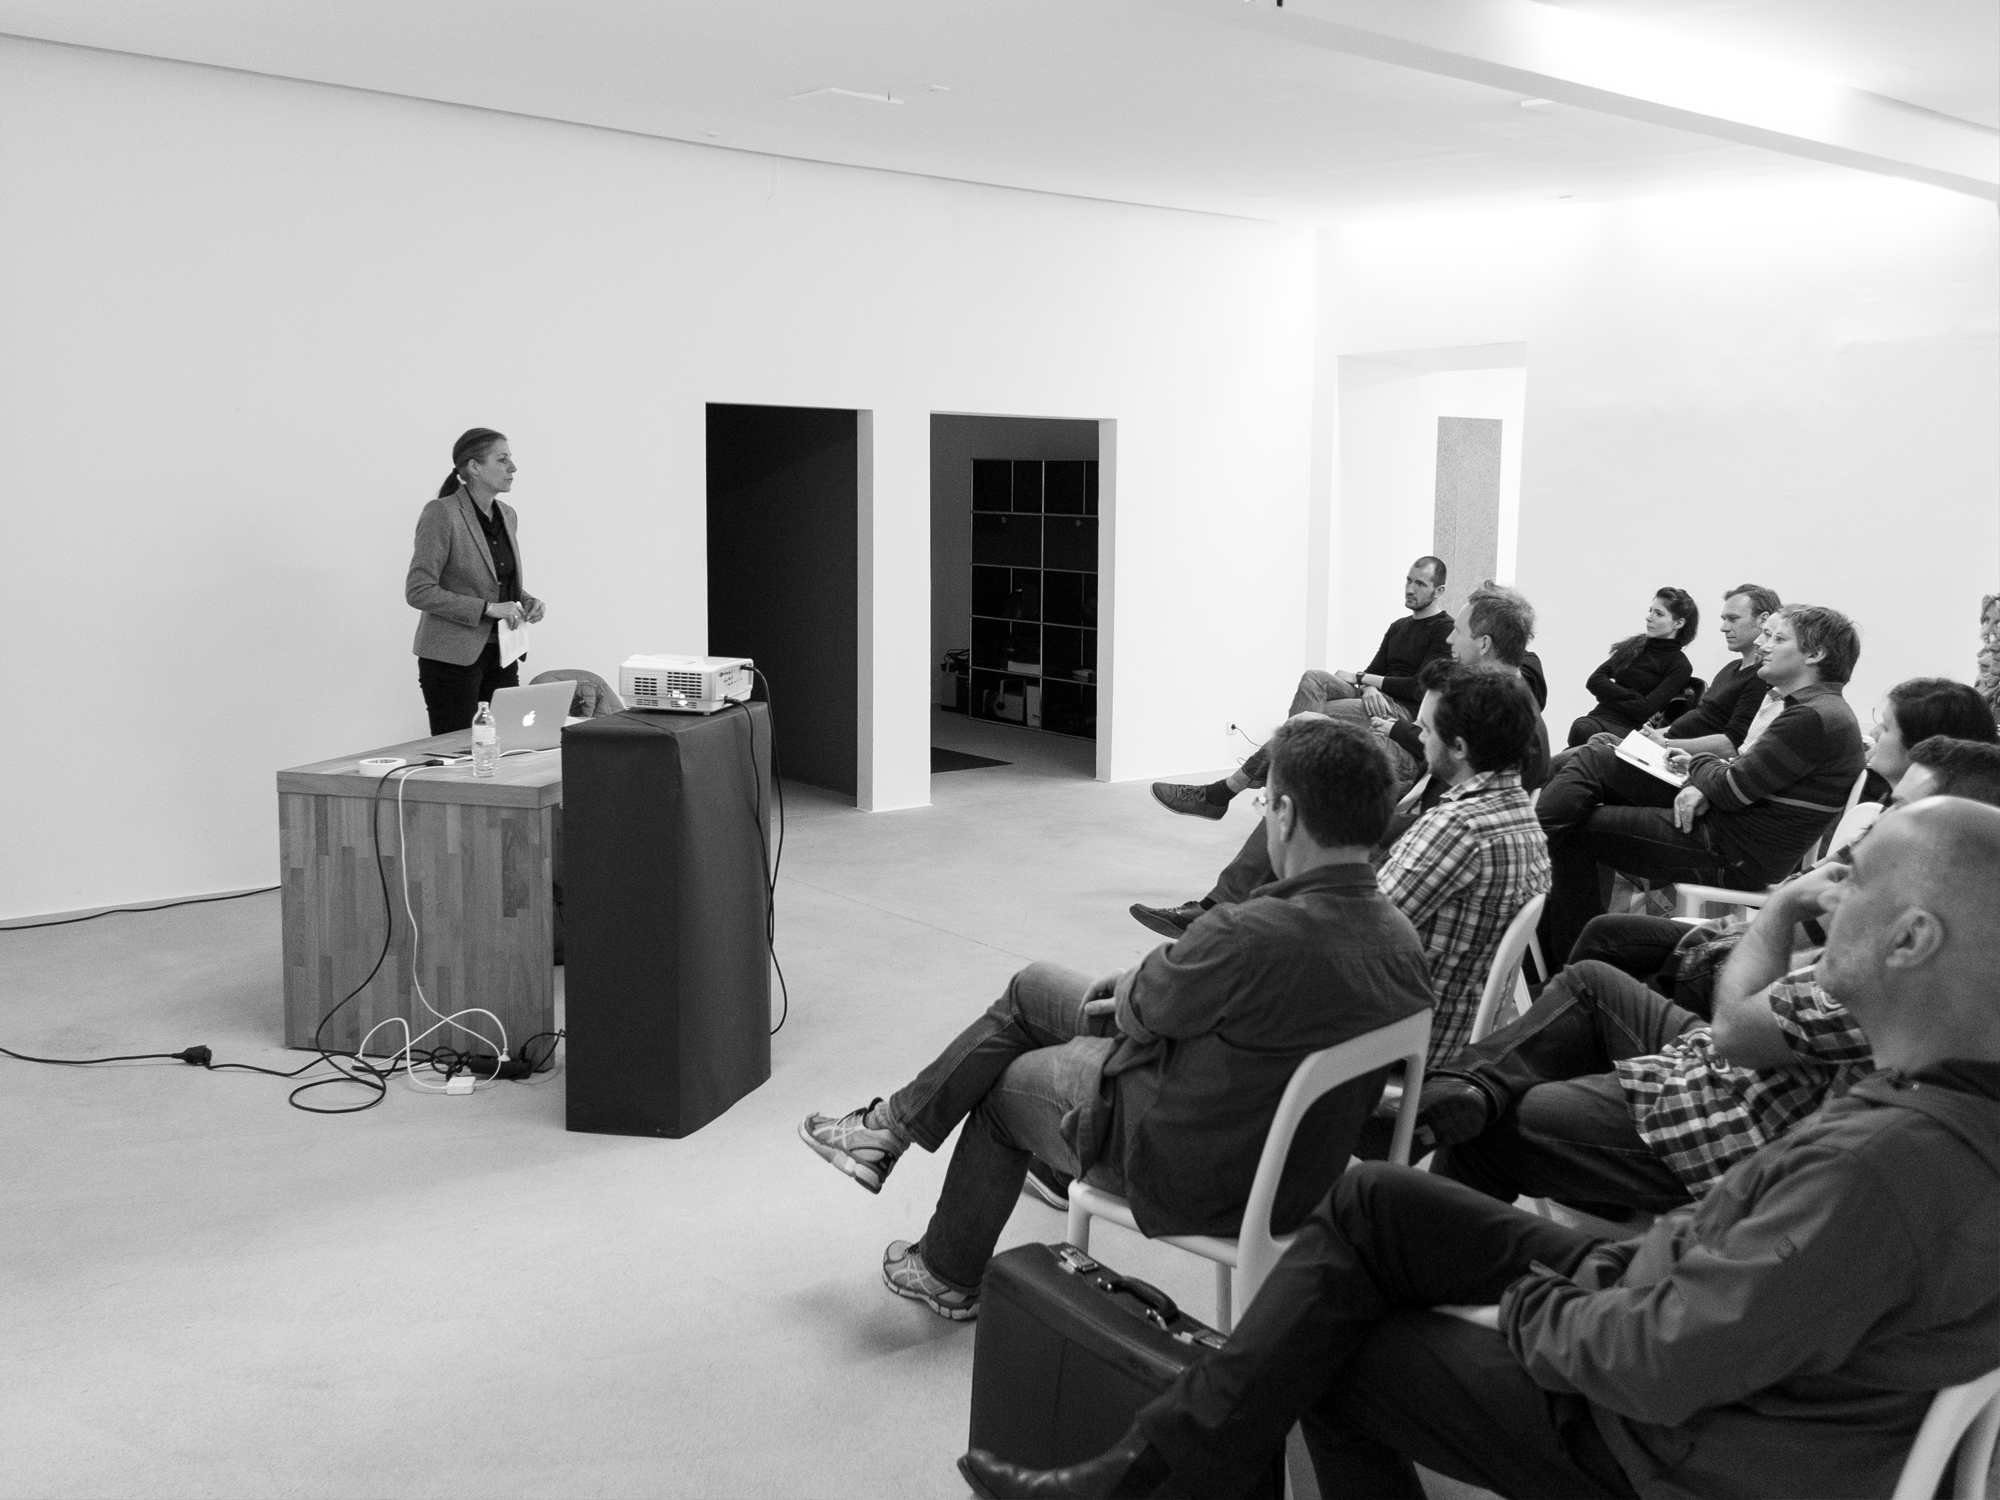 silke-gueldner-coaching-fotografen-hamburg-vortrag